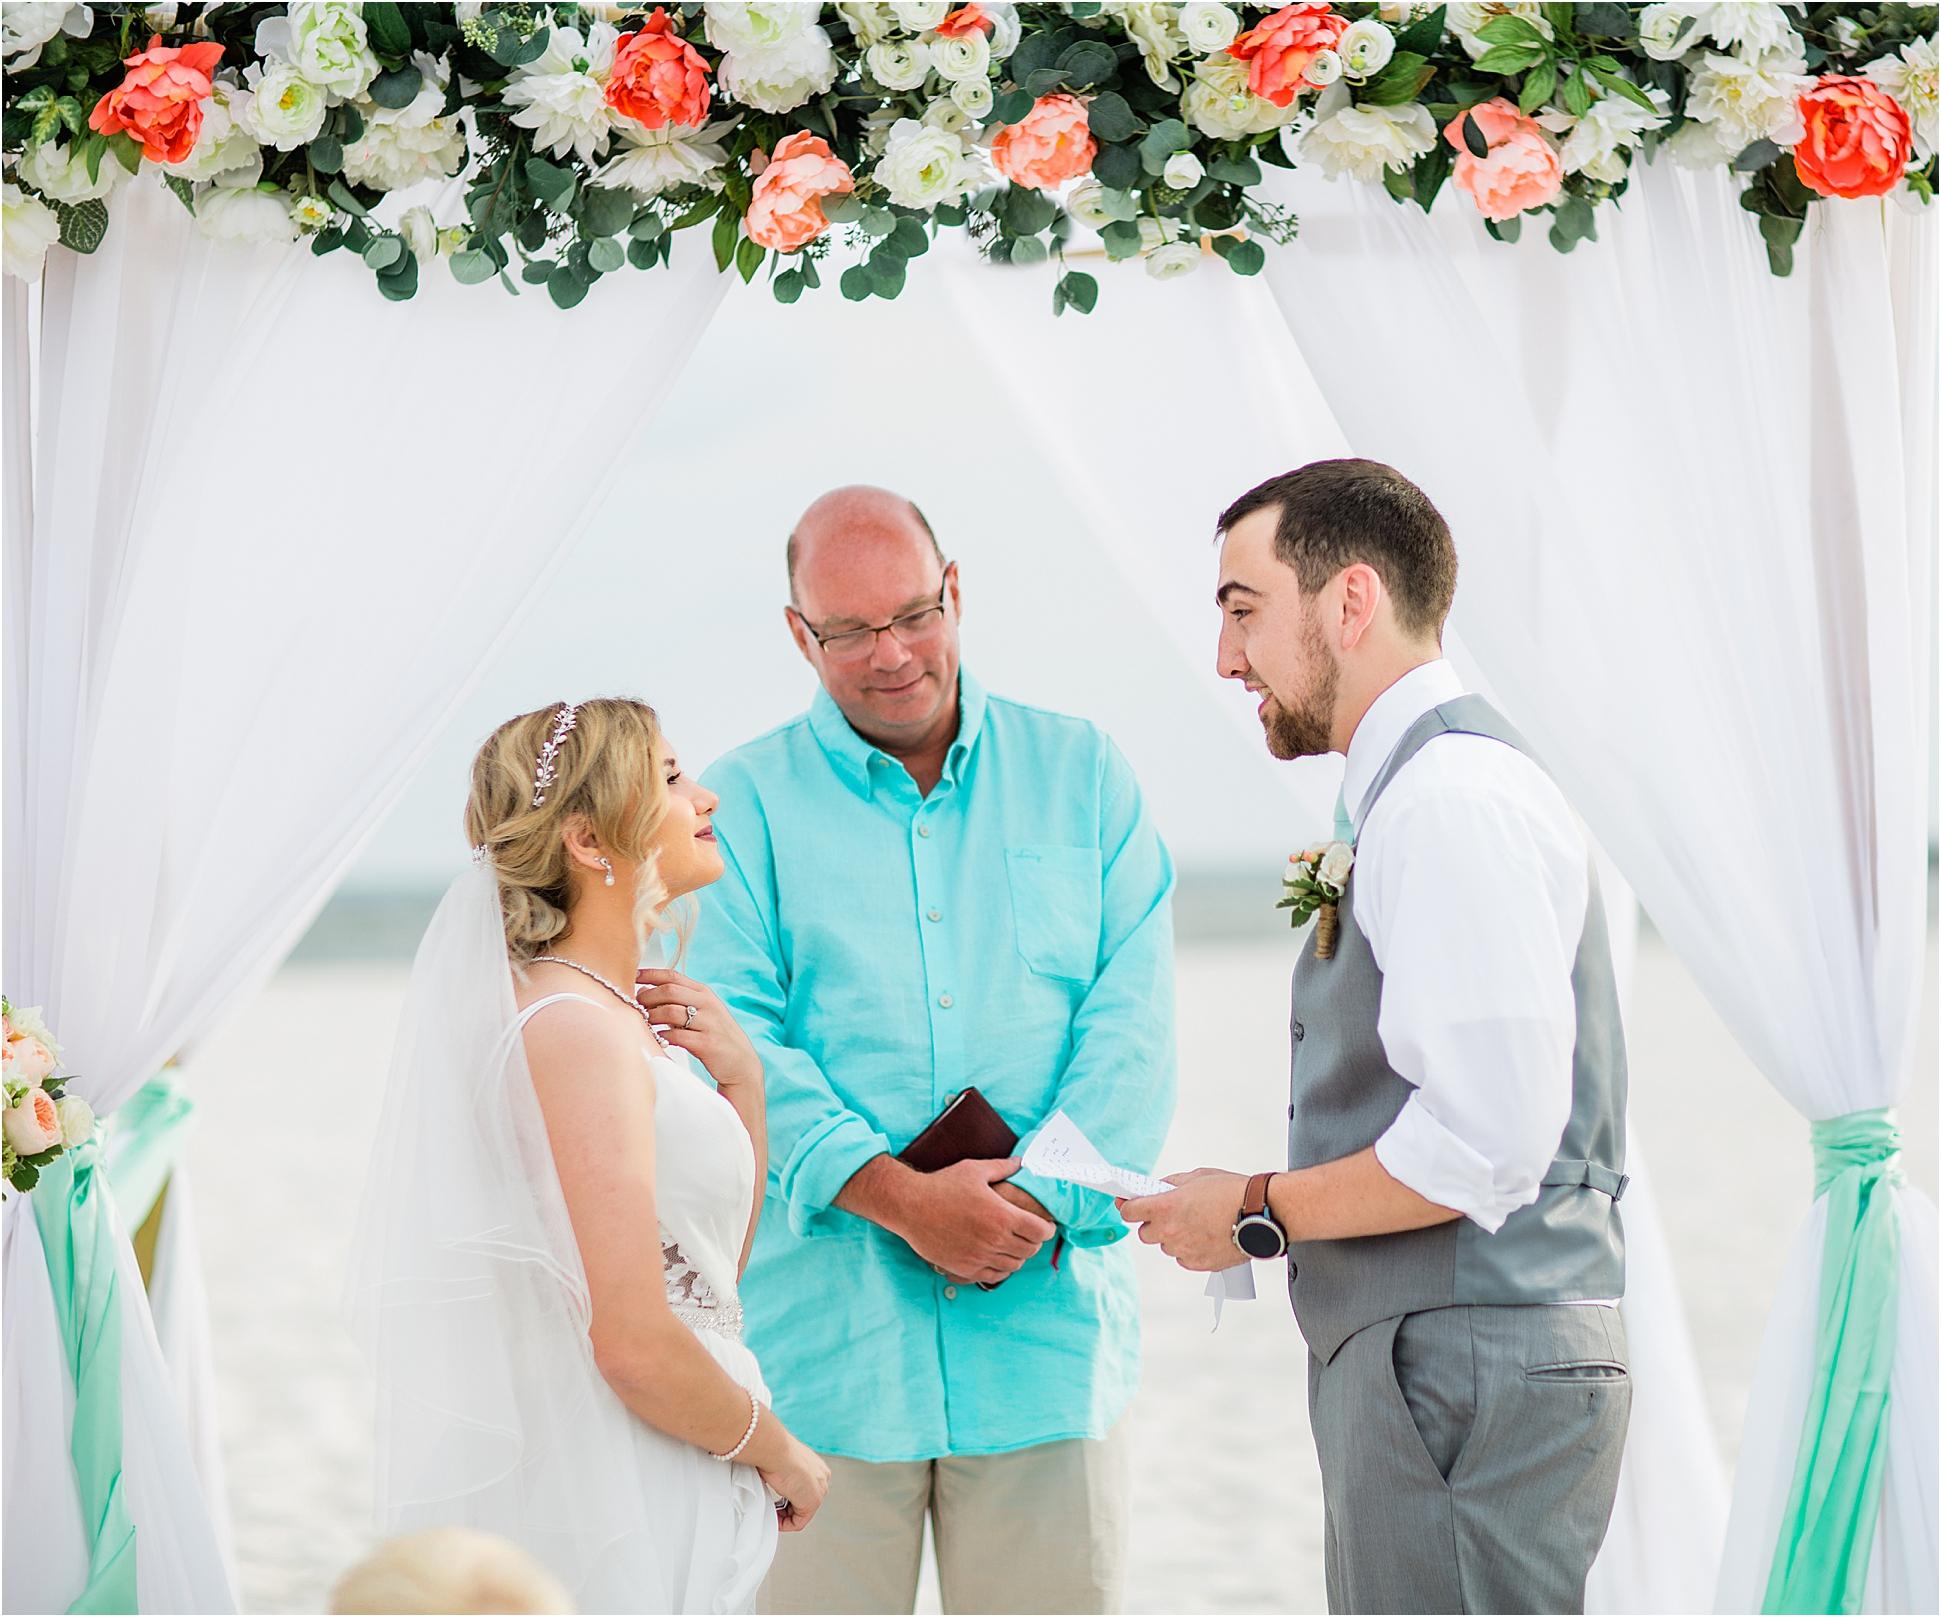 Romantic Weddings in Gulf Shores